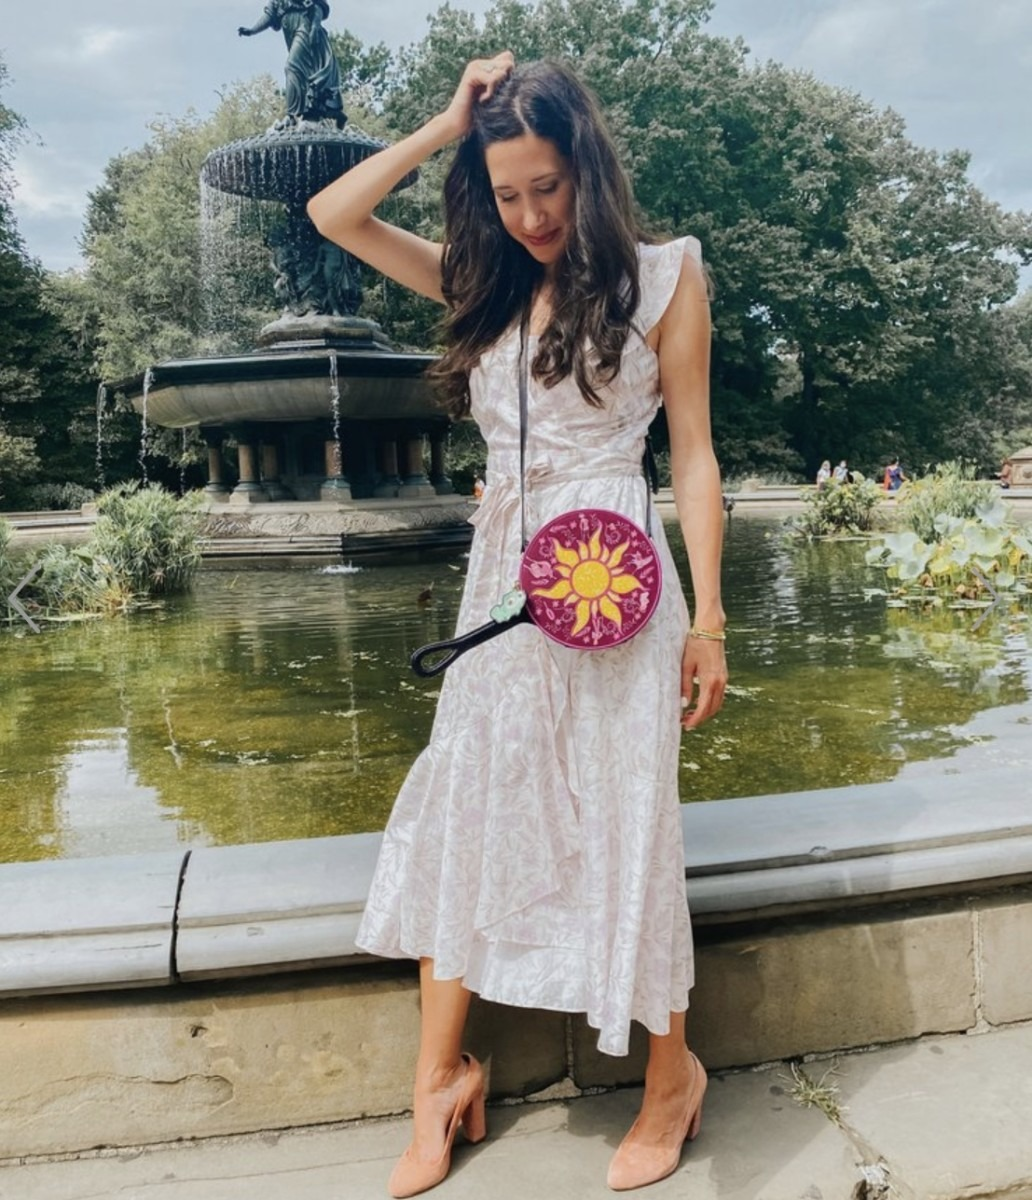 New Rapunzel Frying Pan Crossbody Bag from Danielle Nicole 2